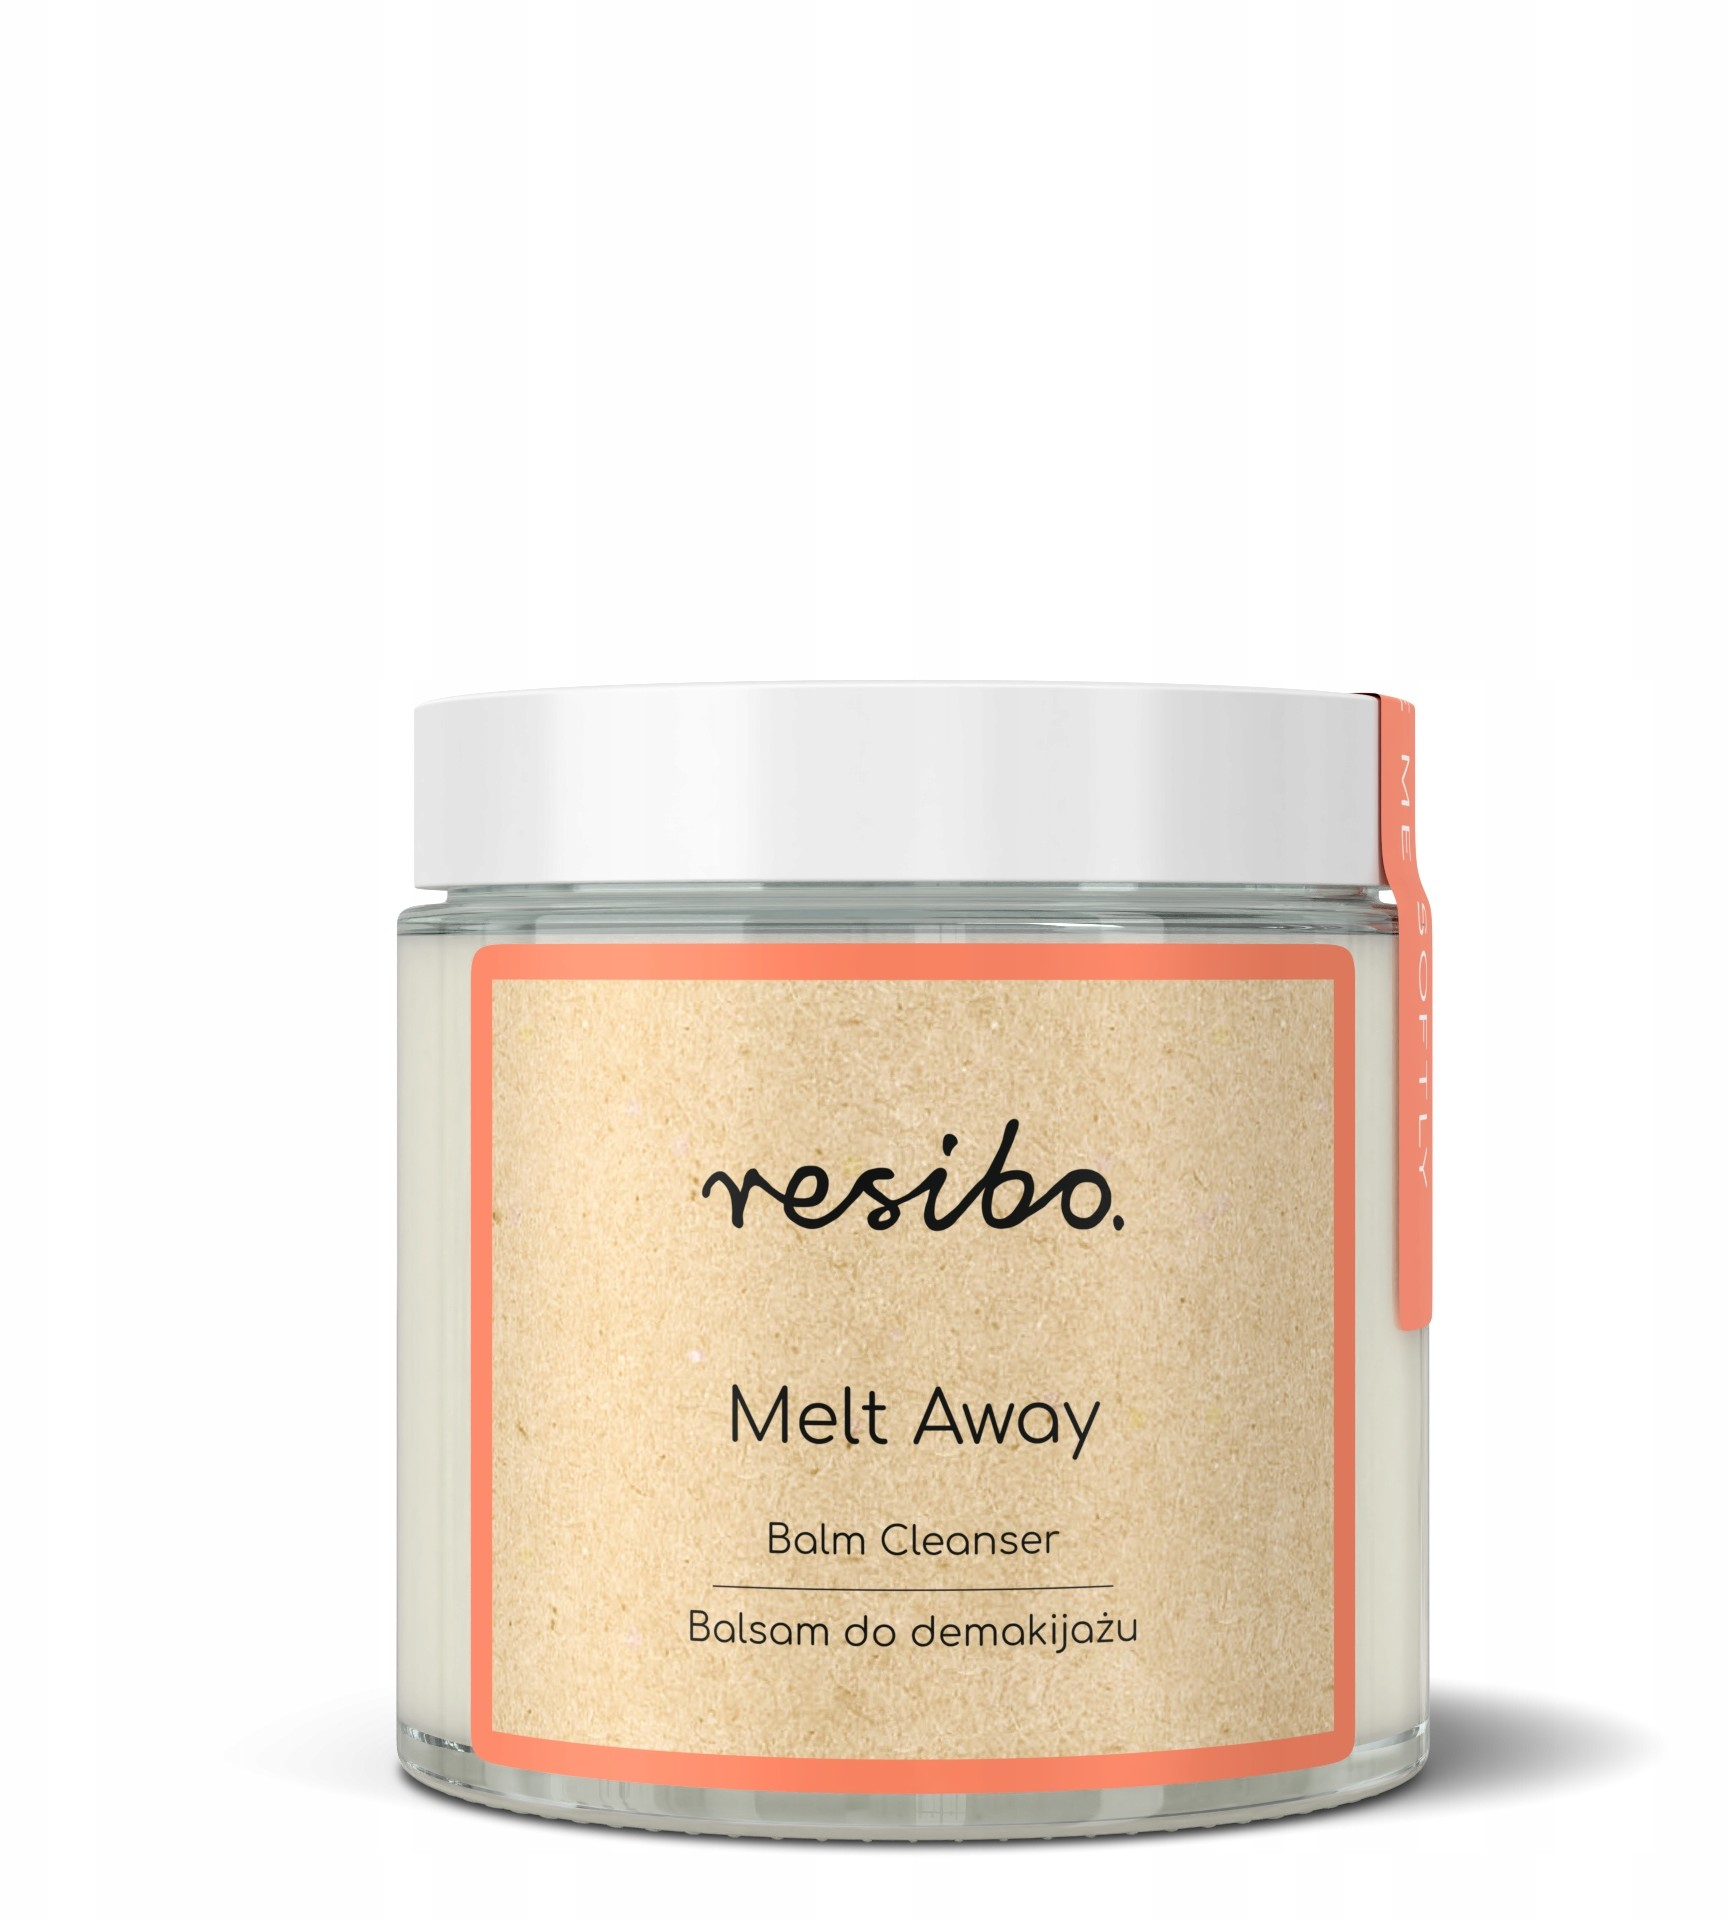 Resibo - Balsam do demakijażu Melt Away